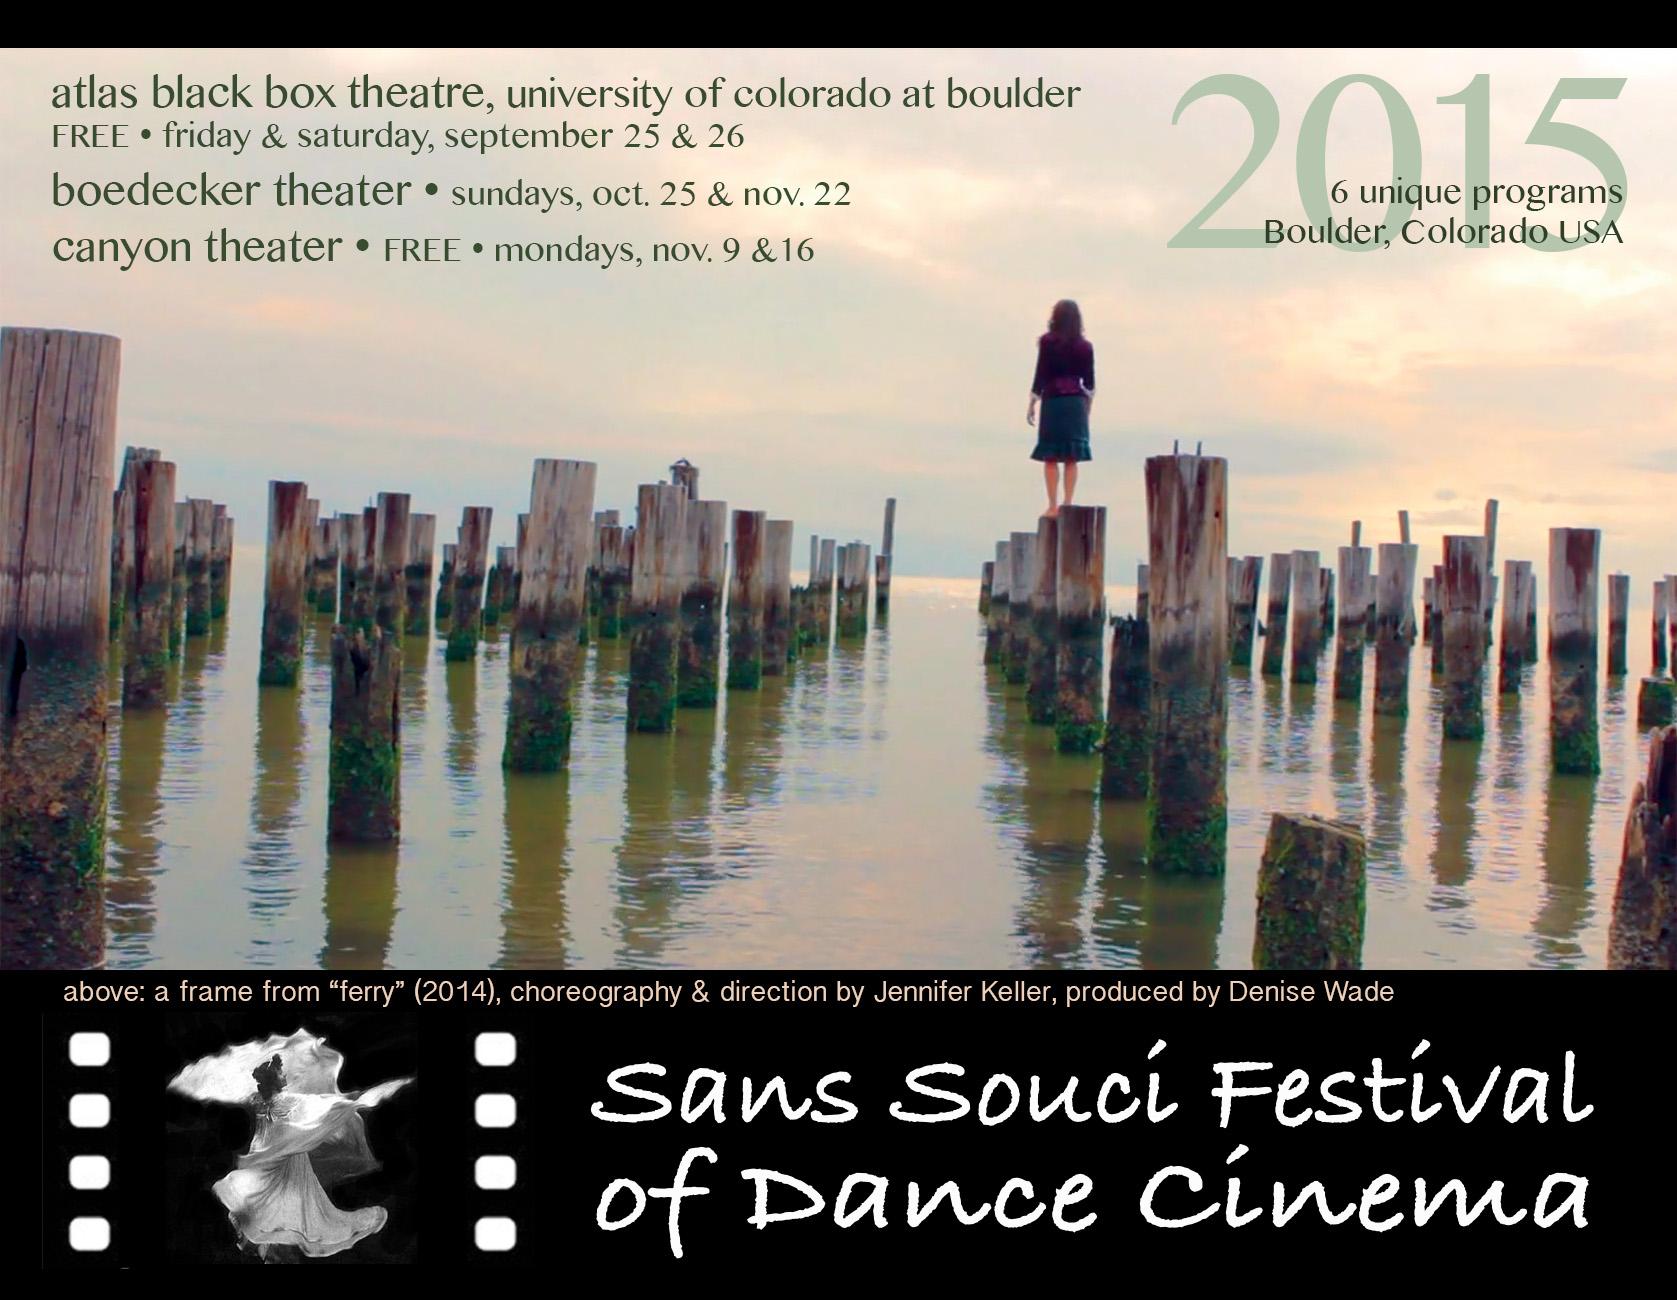 Twelfth Annual Sans Souci Festival of Dance Cinema